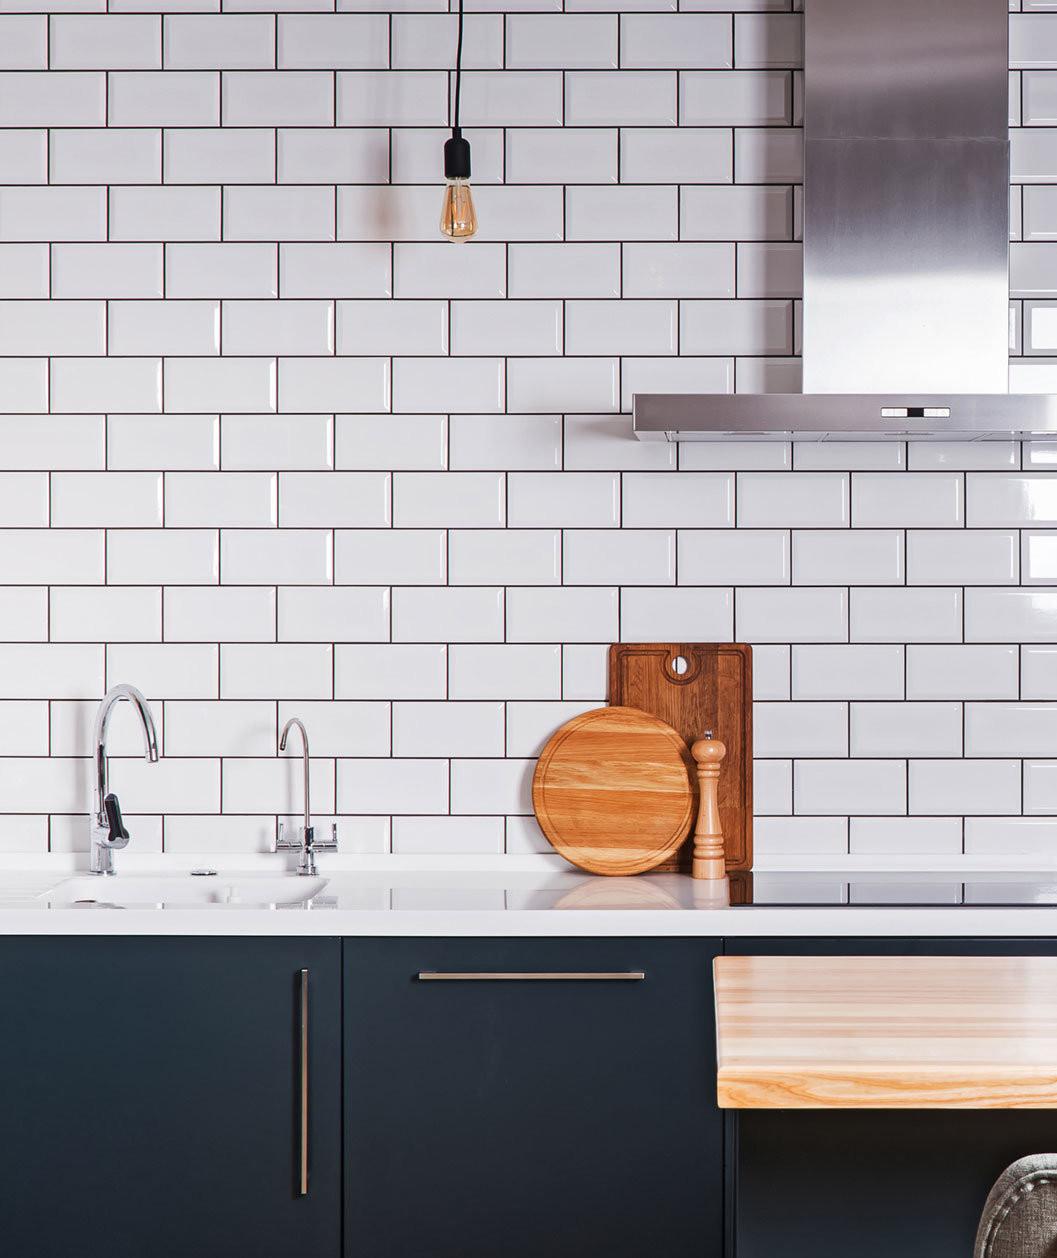 Kitchen Subway Tile Backsplash Designs  Kitchen Tile Backsplash Ideas You Need to See Right Now